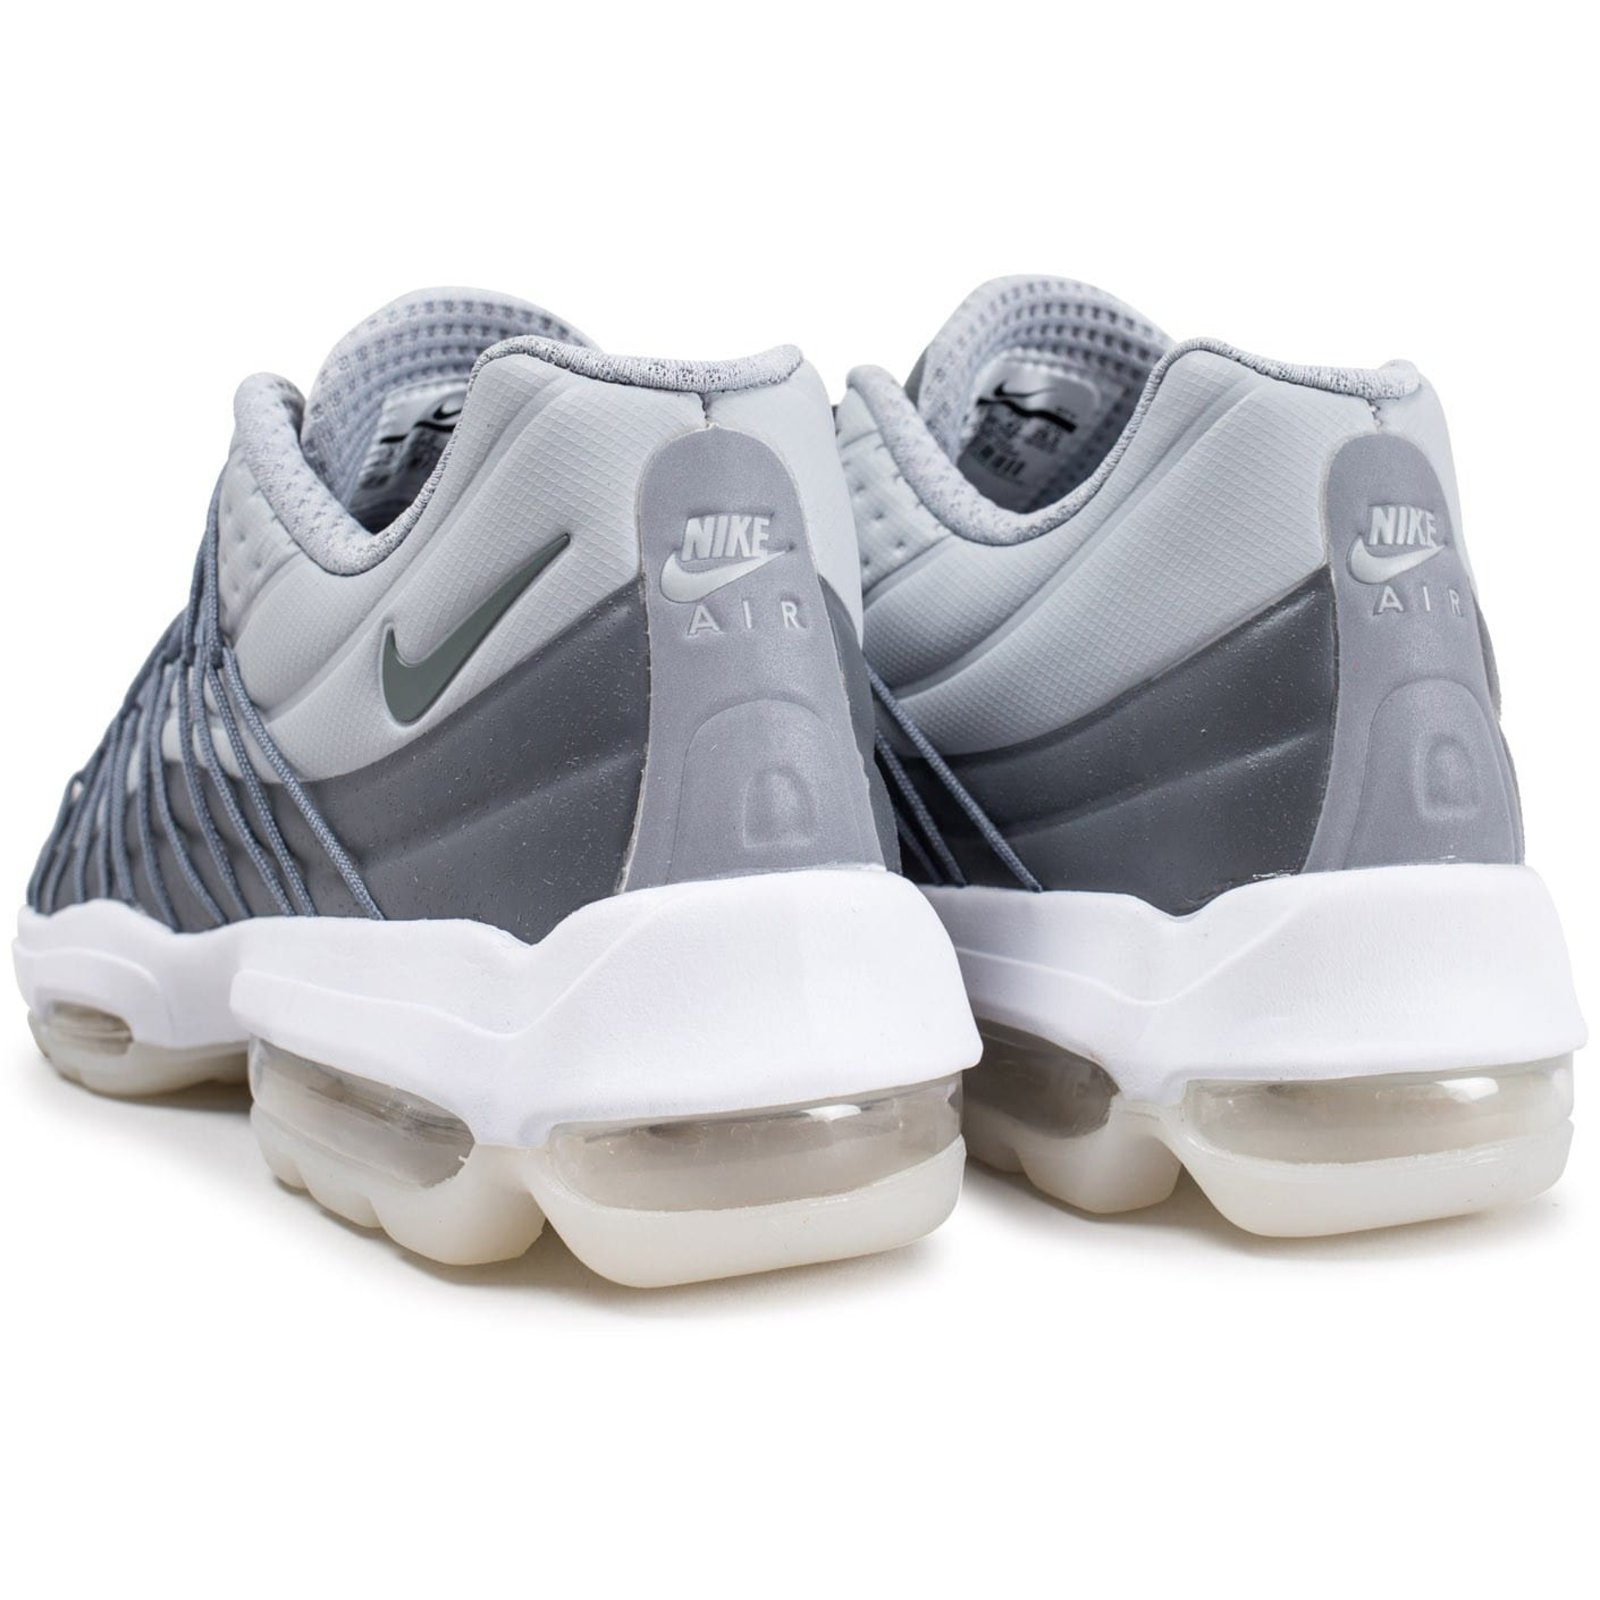 547eb4e1e141 Nike Air max 95 ultra Sneakers Sneakers Rubber Grey ref.61213 - Joli Closet